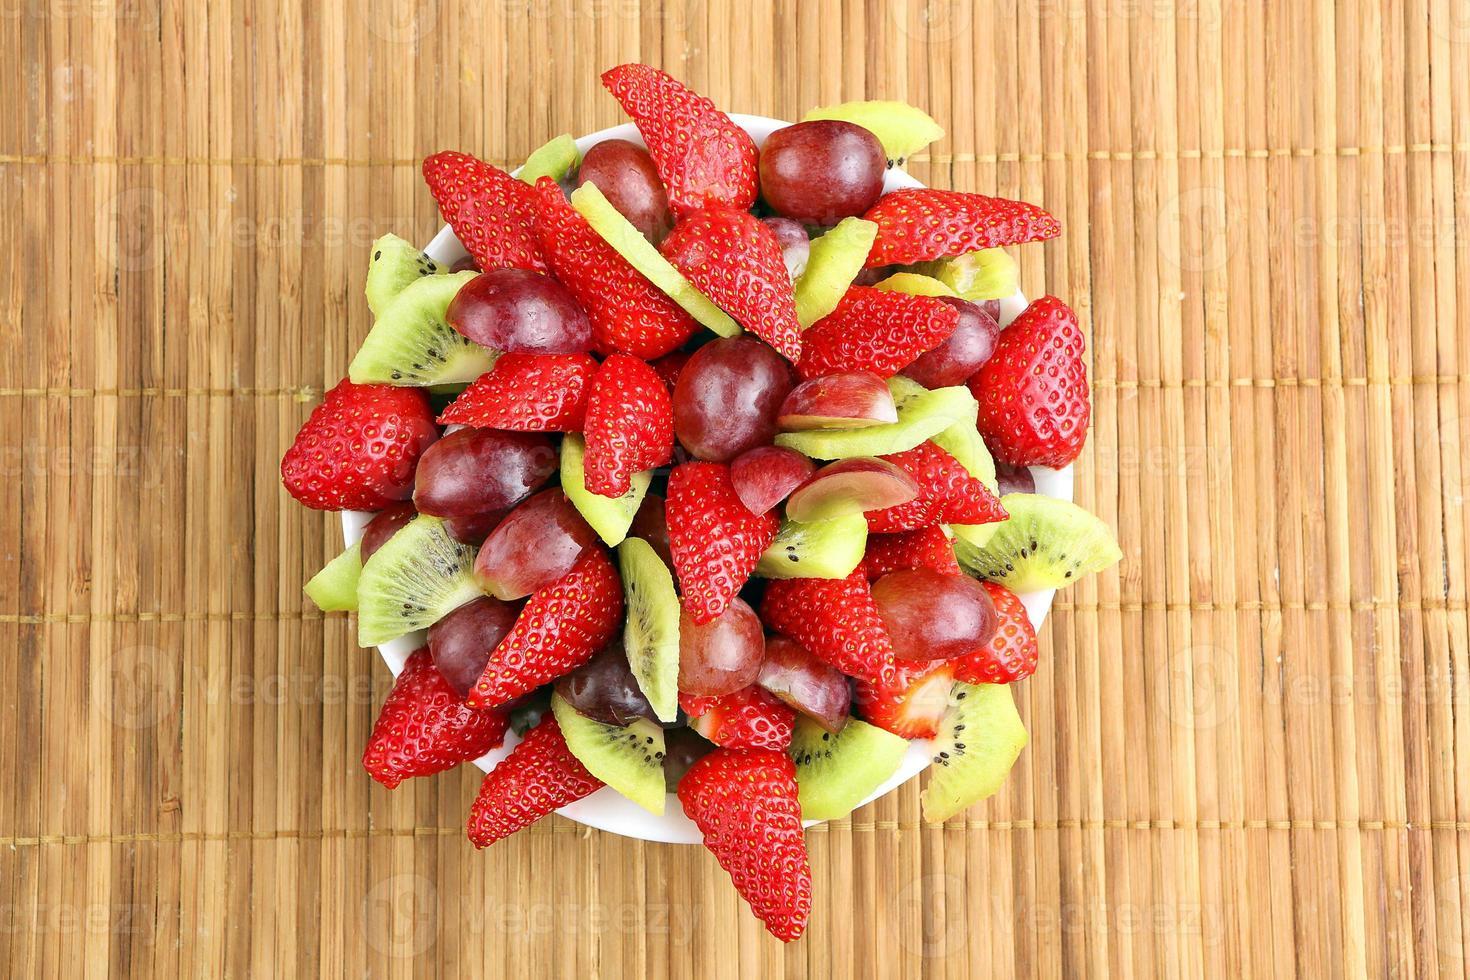 fruitsalade met aardbeien, druiven en kiwi op rotan backgro foto